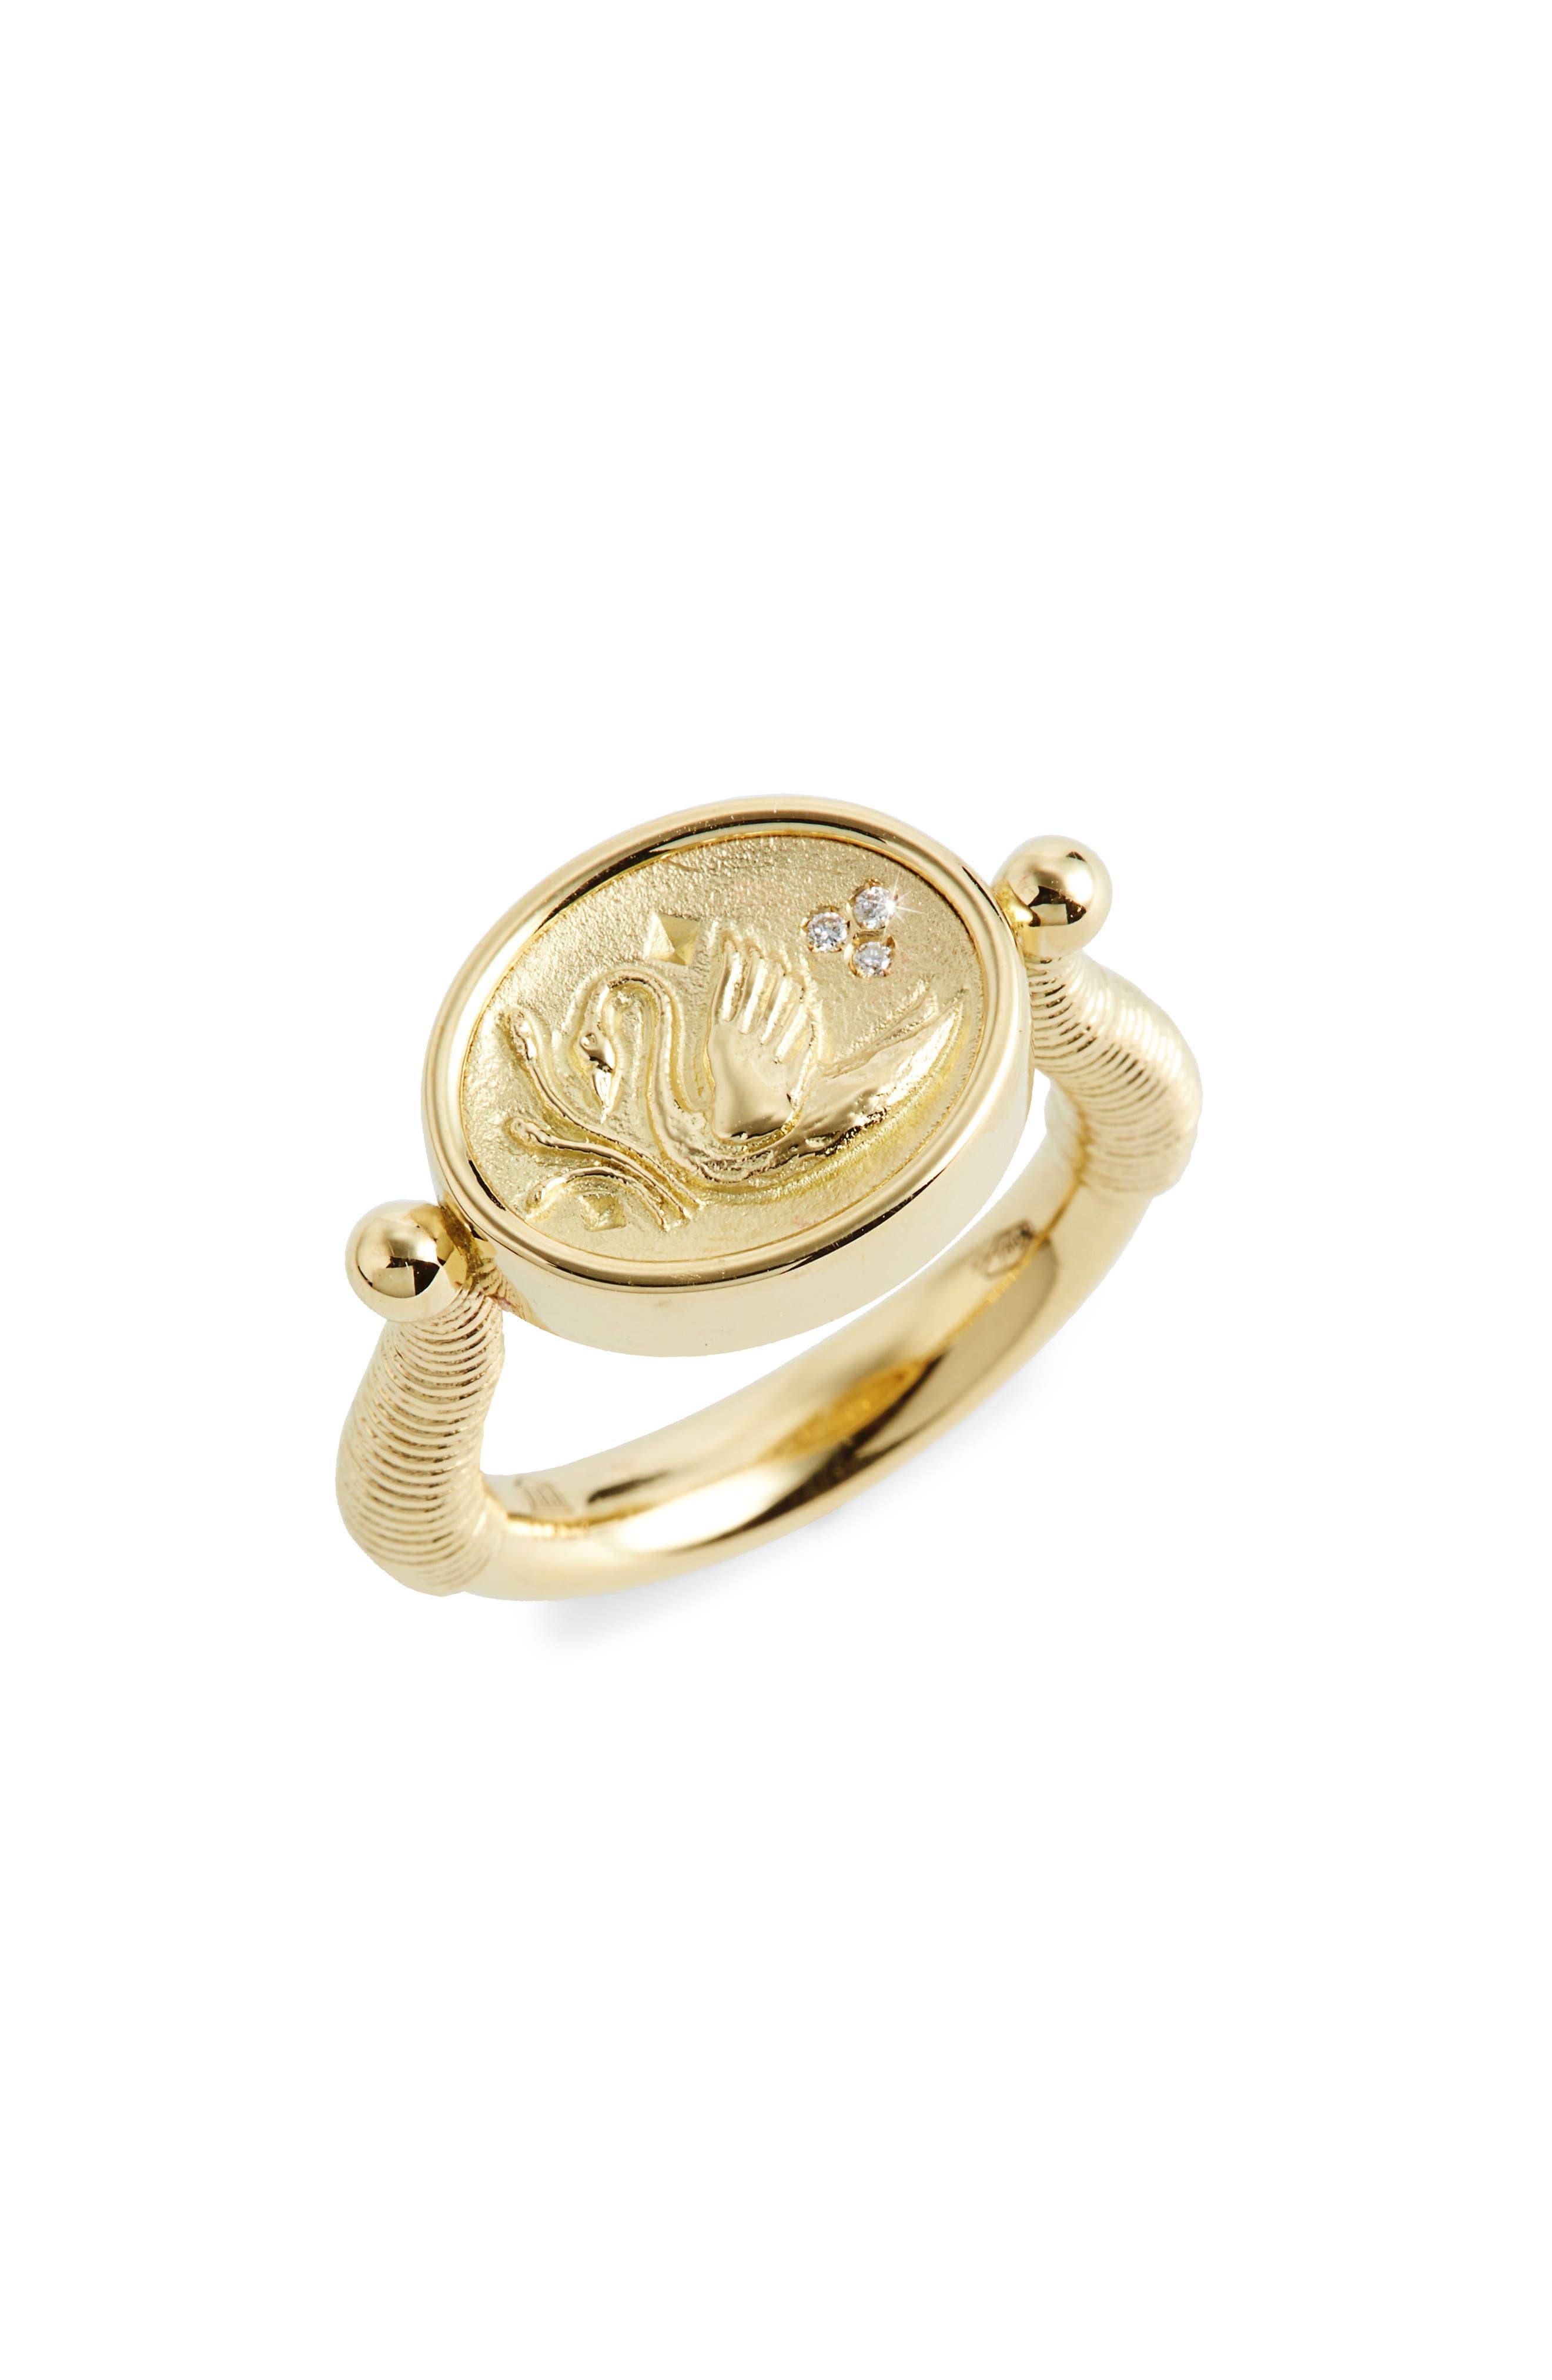 Temple St. Clair Object Trouvé Swan Coin Diamond Ring,                             Main thumbnail 1, color,                             710